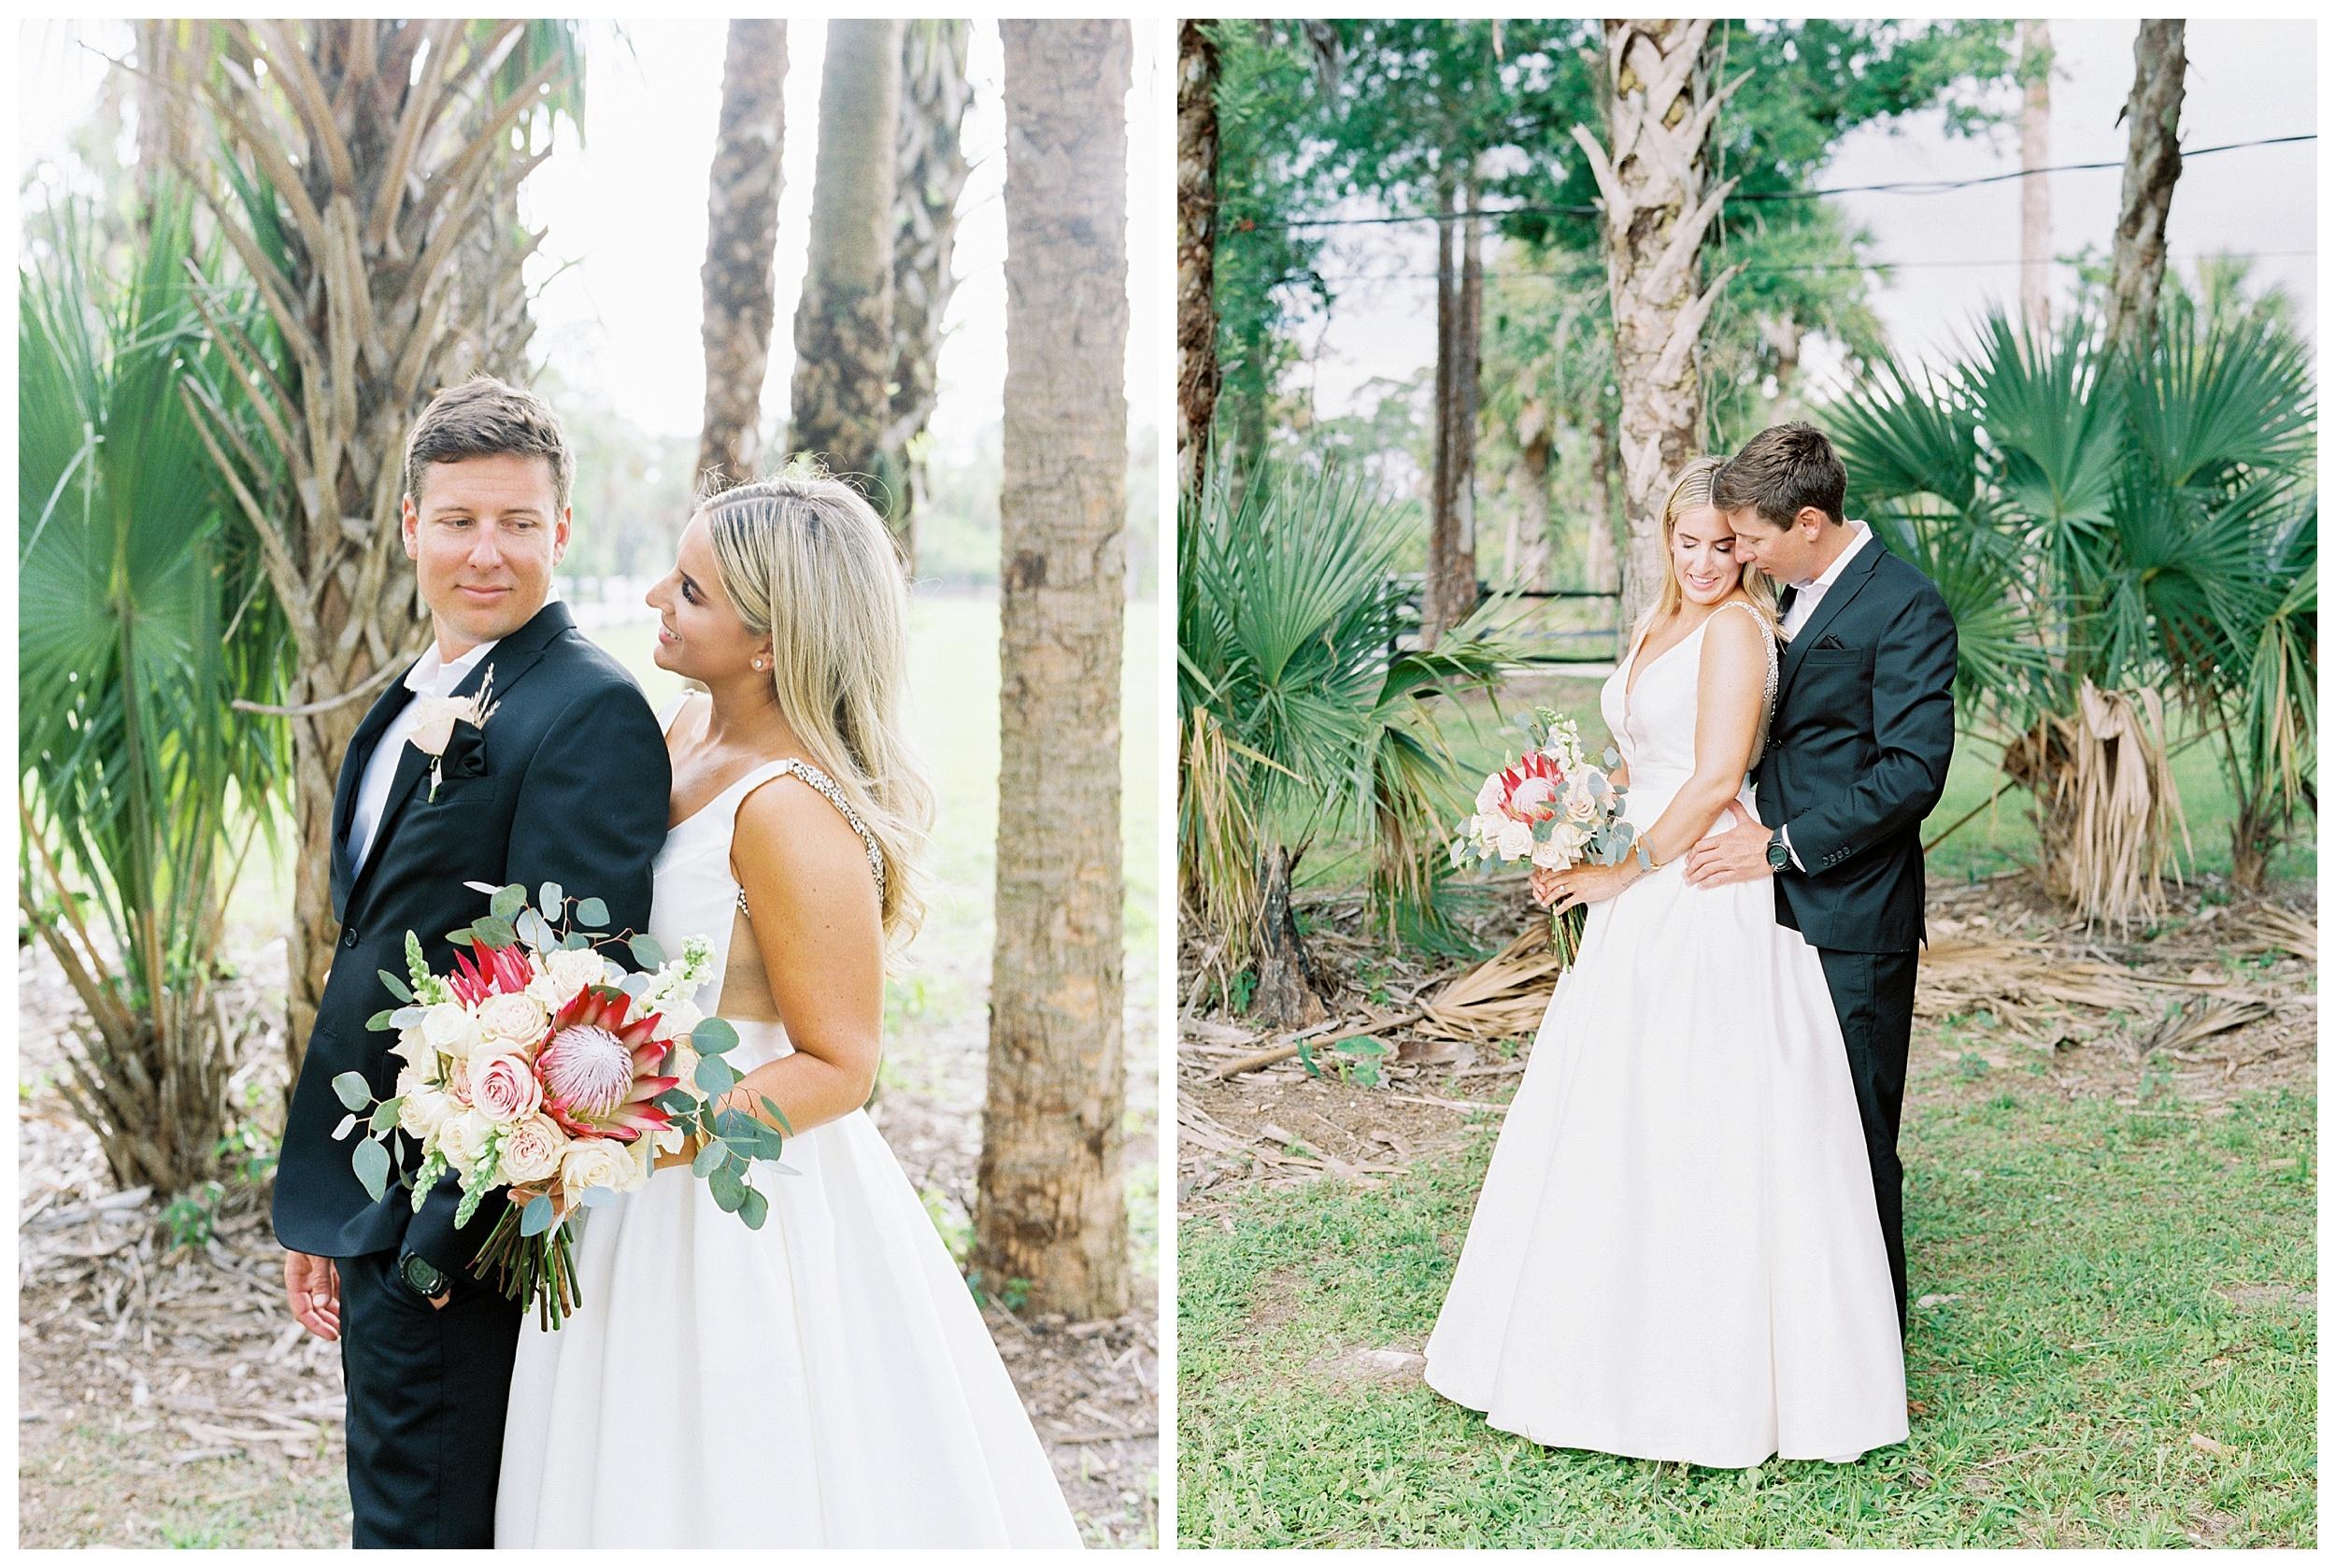 South Florida Wedding Photographer Kir Tuben_0041.jpg